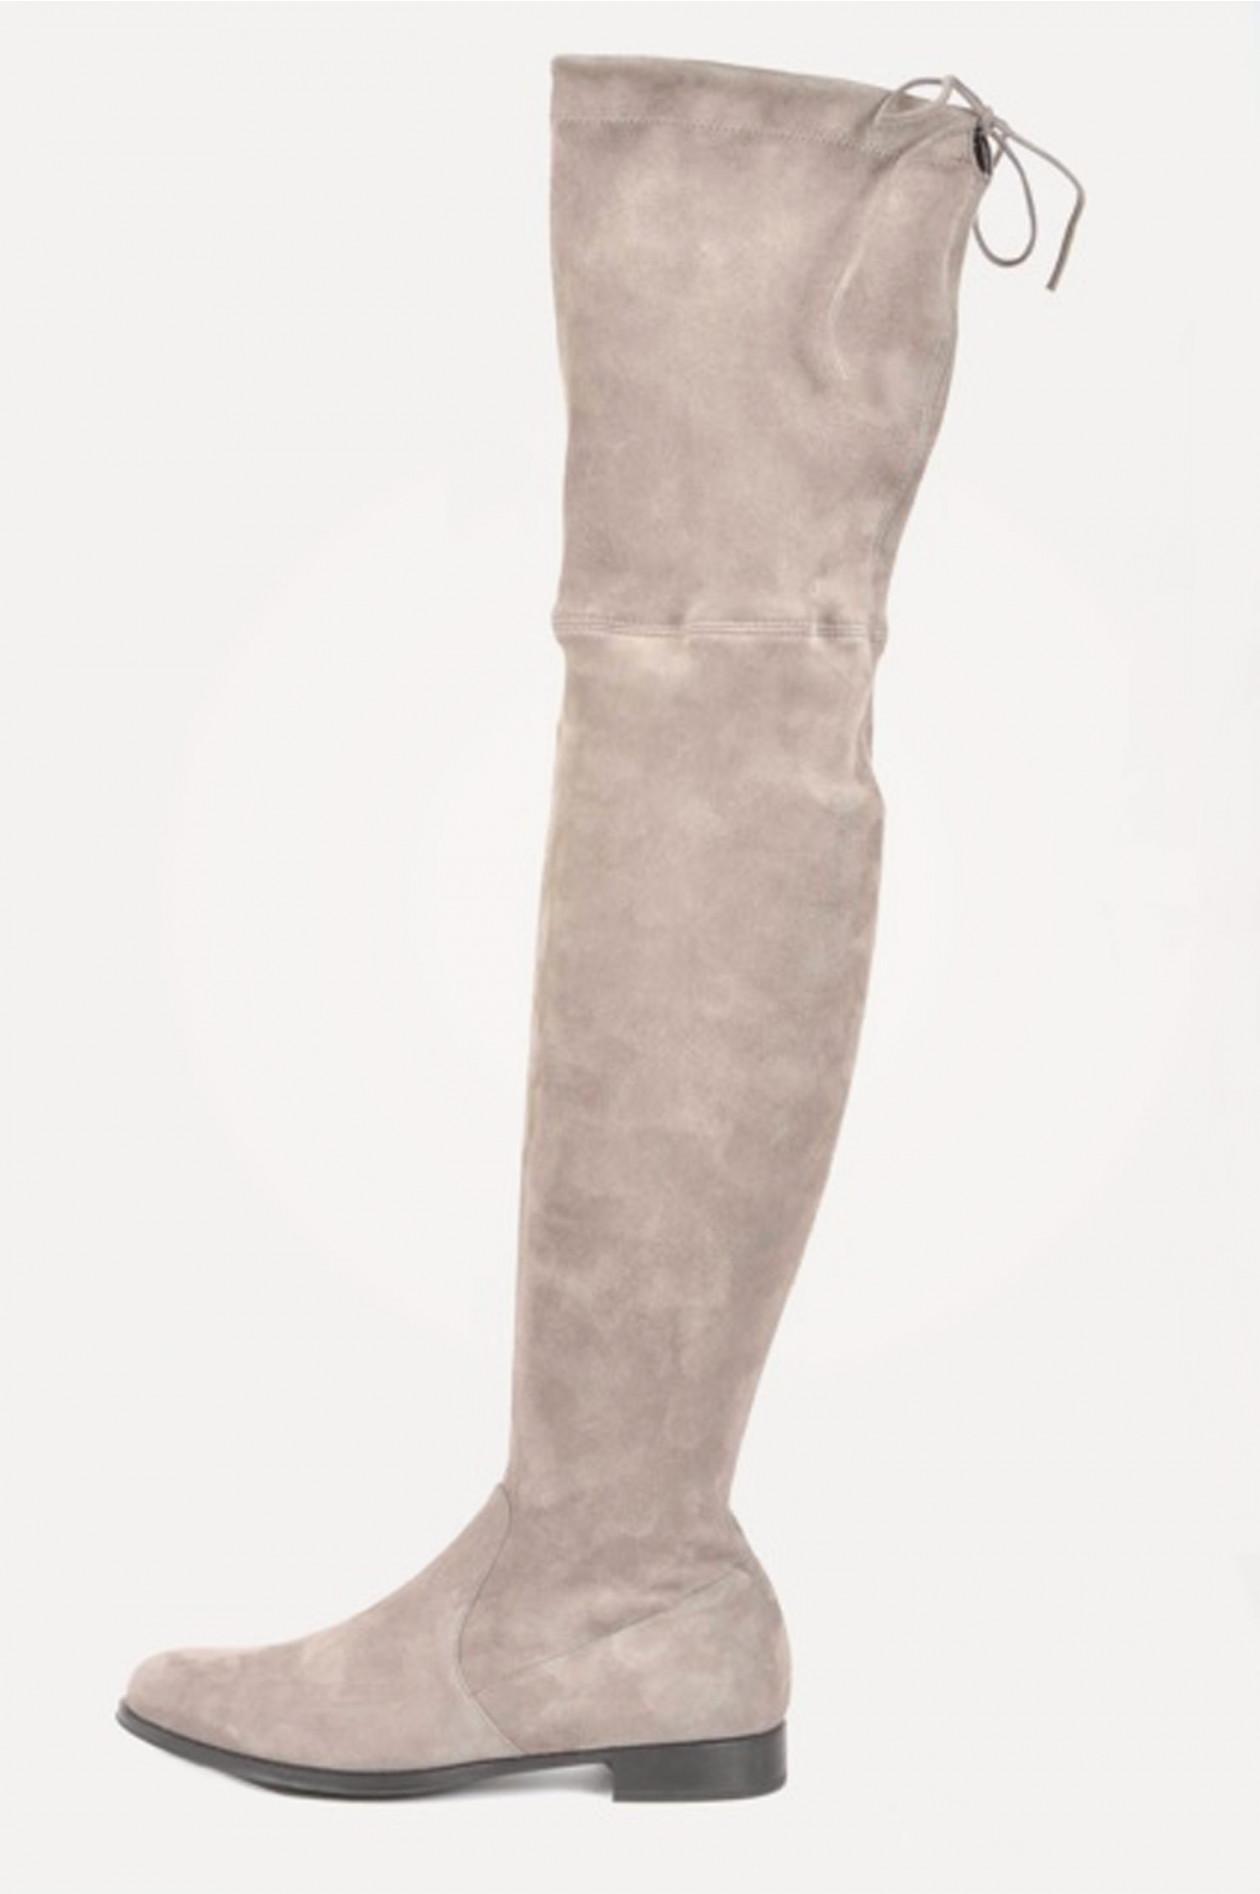 premium selection 072a9 203a8 Overknee - Stiefel aus Veloursleder in Grau